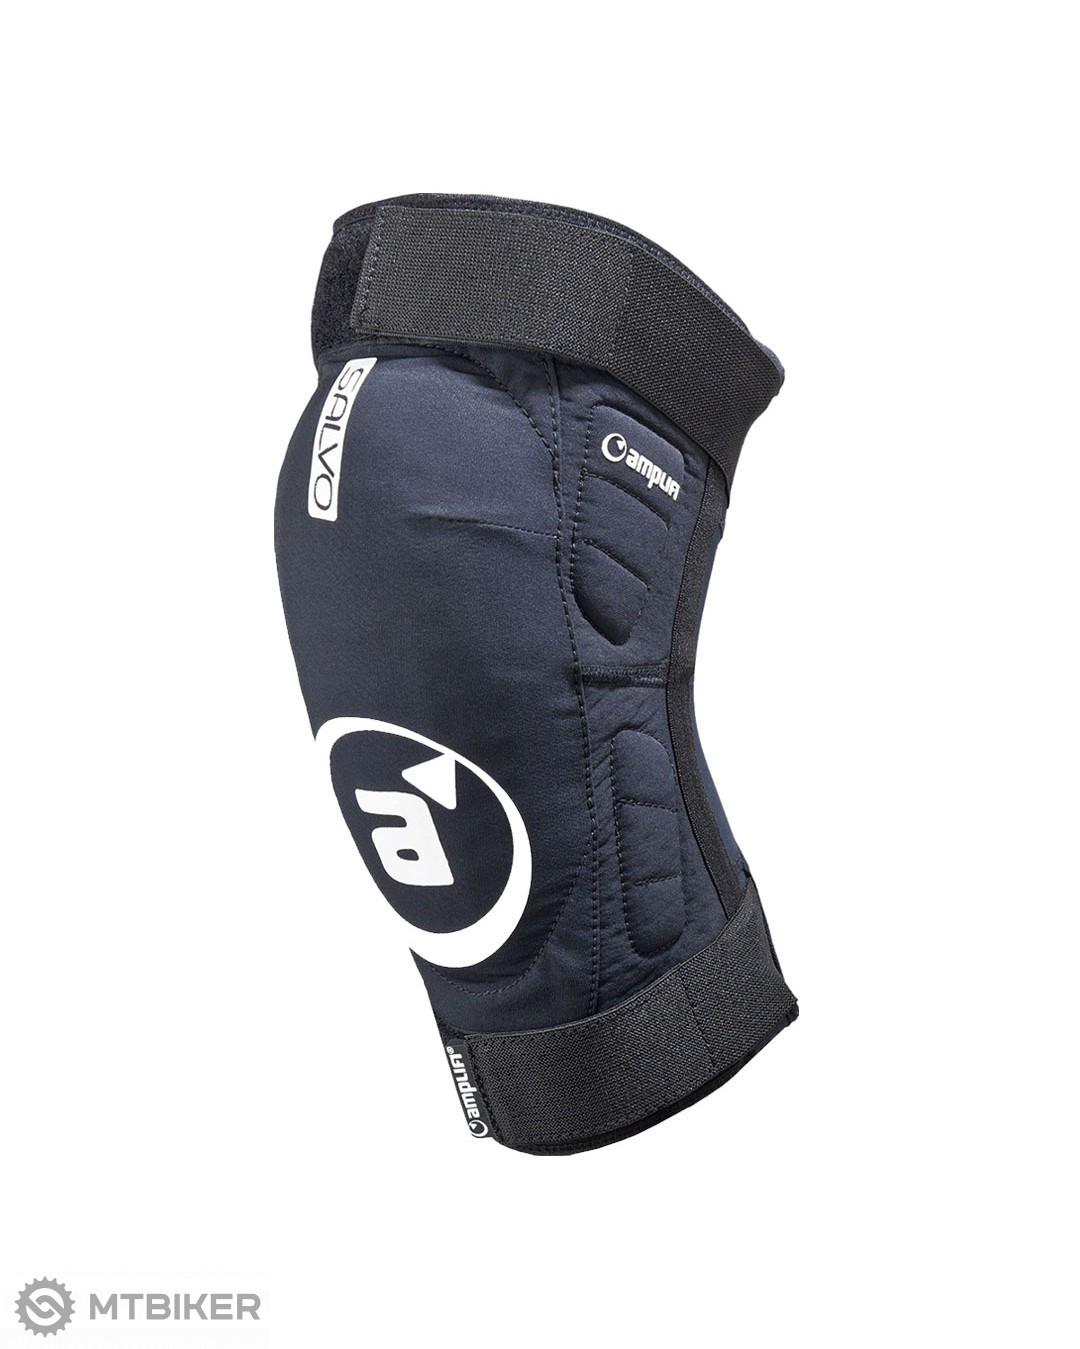 Amplifi Salvo Joint Knee chrániče na kolená